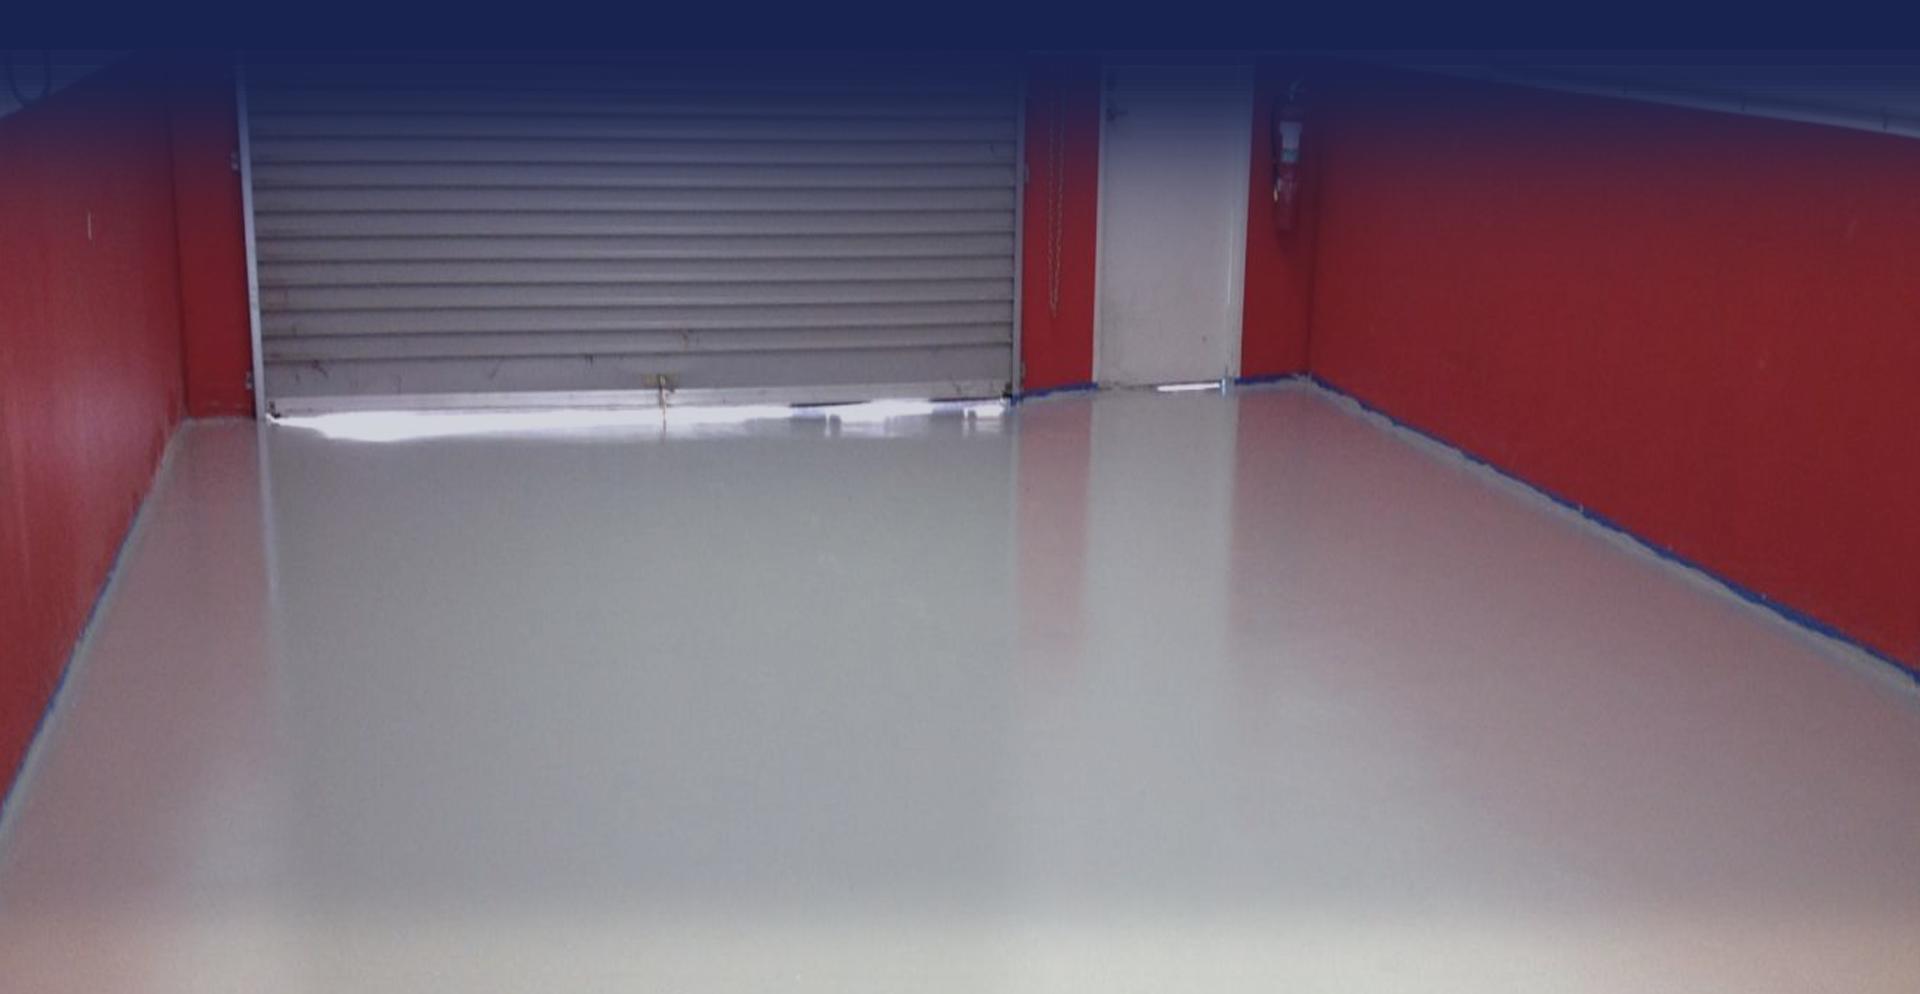 Solvent-based anti-static coating KERACOTE EC50